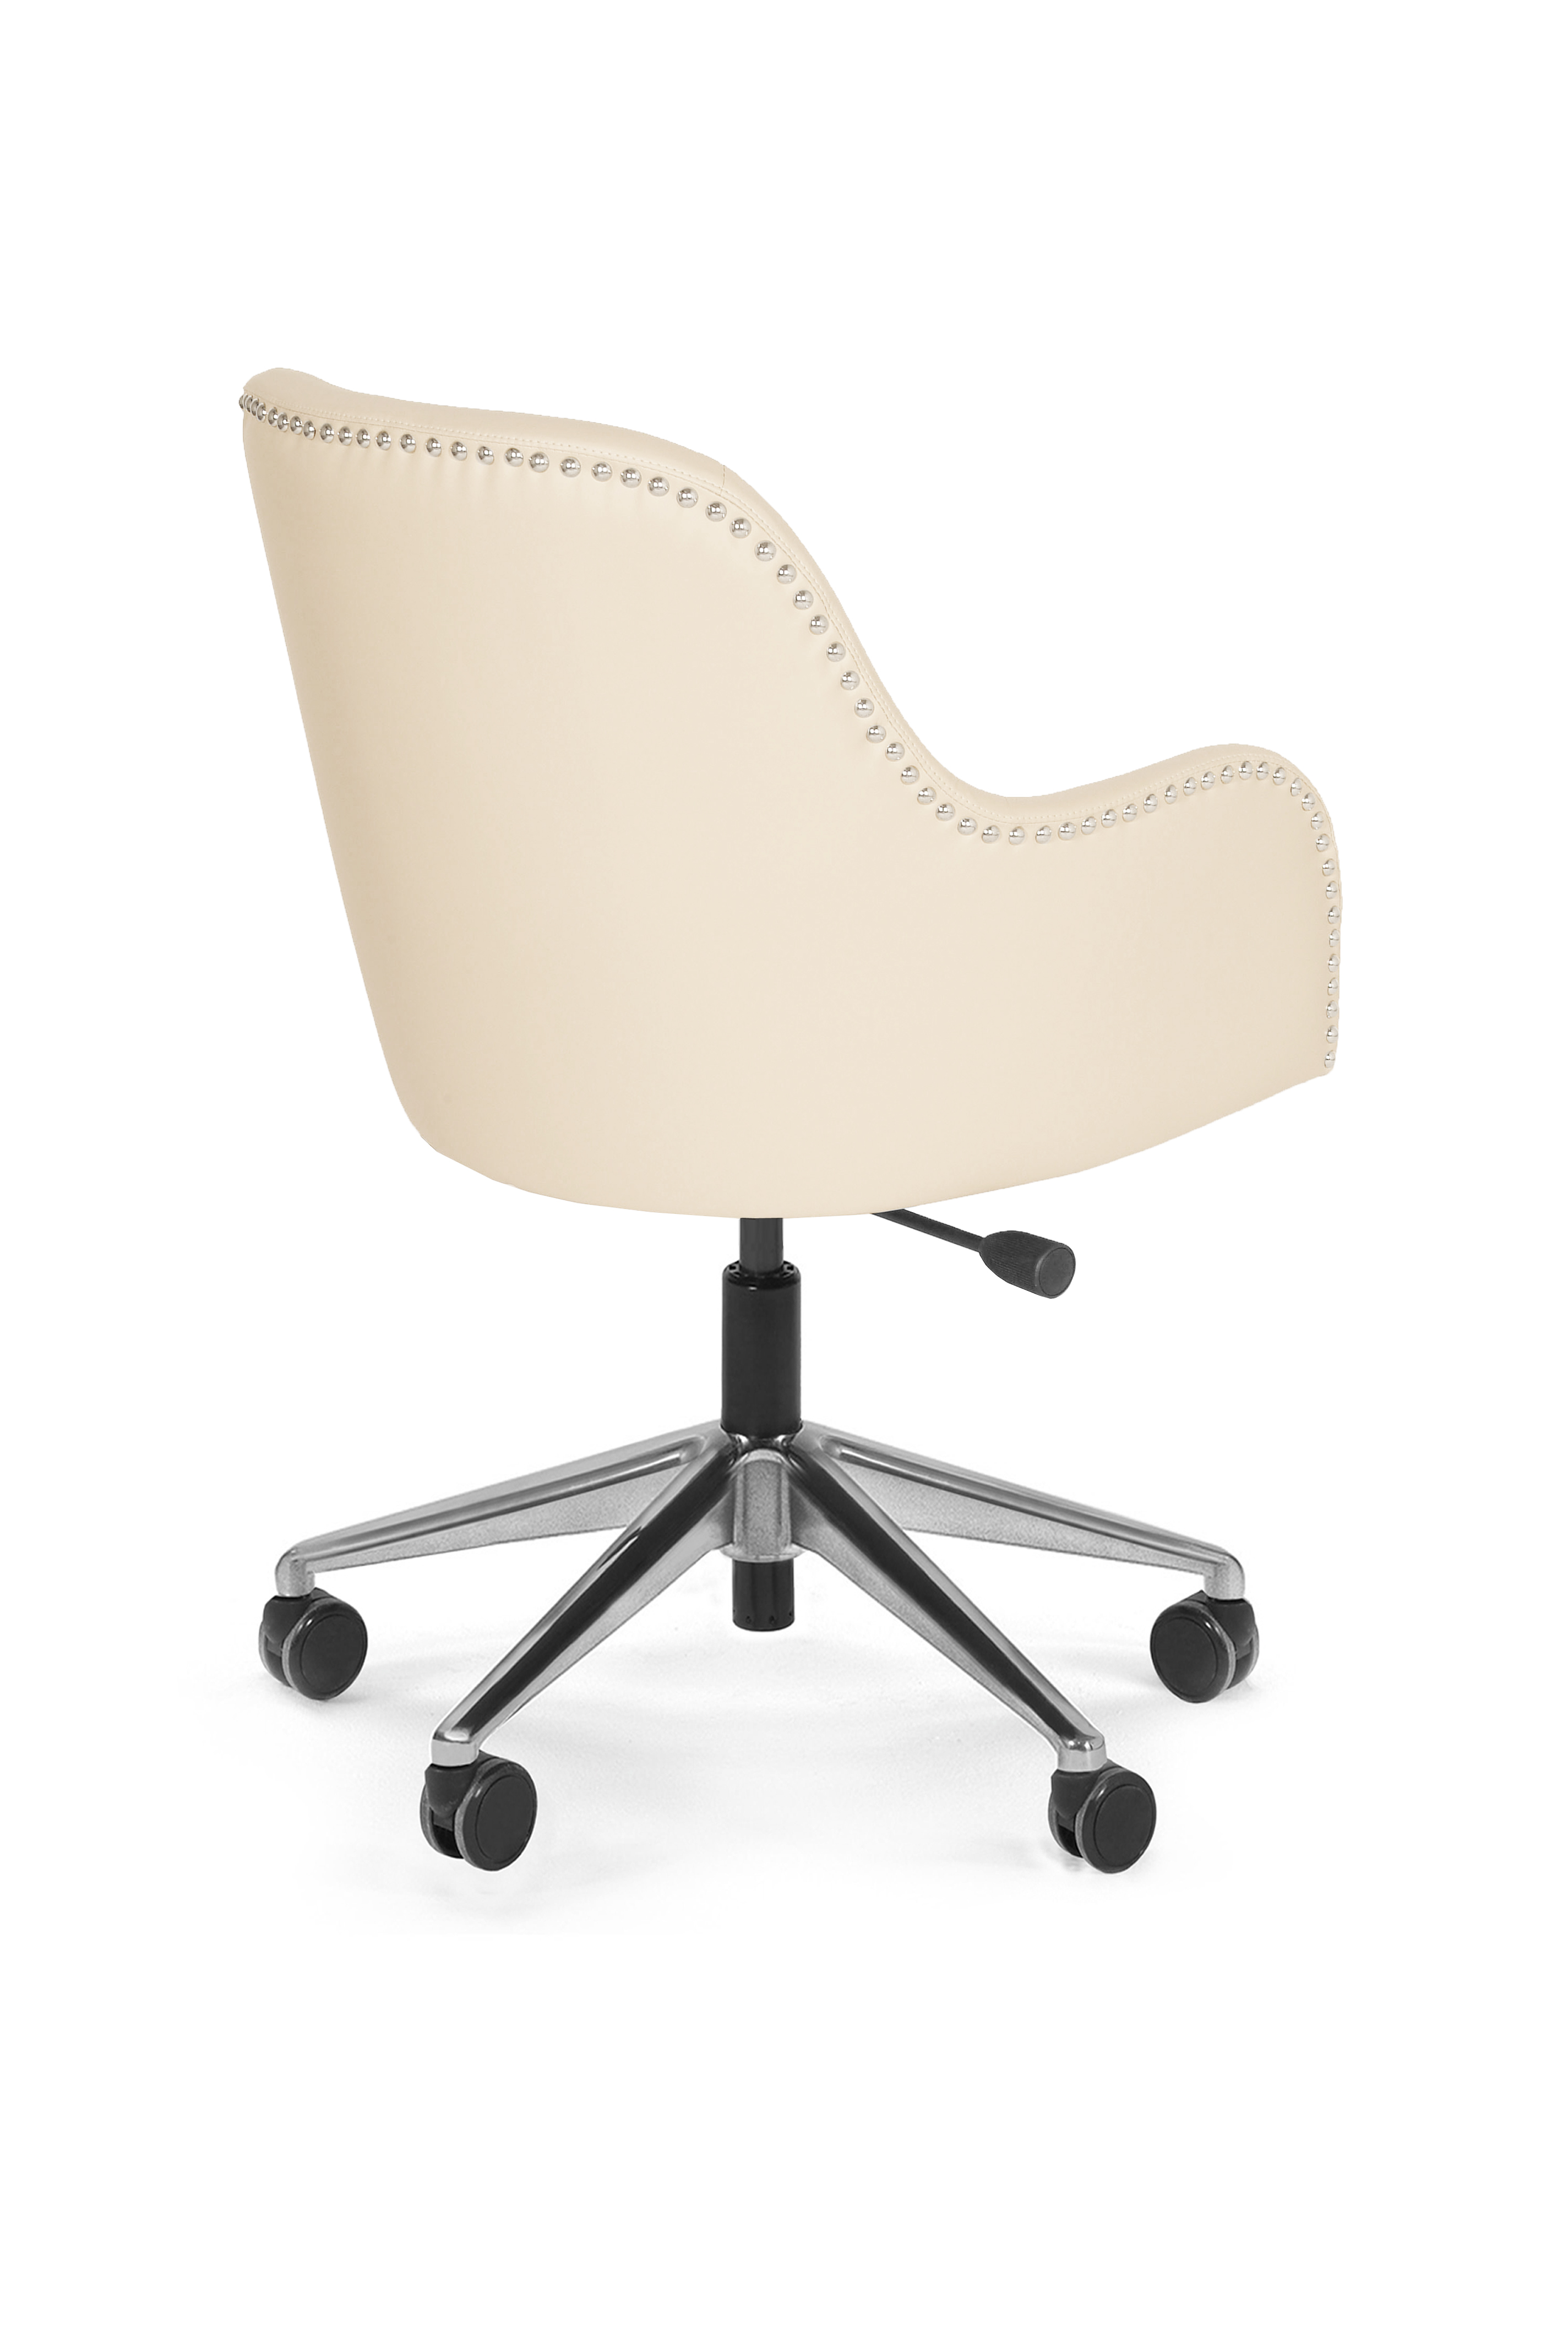 Custom Desk Chair 2